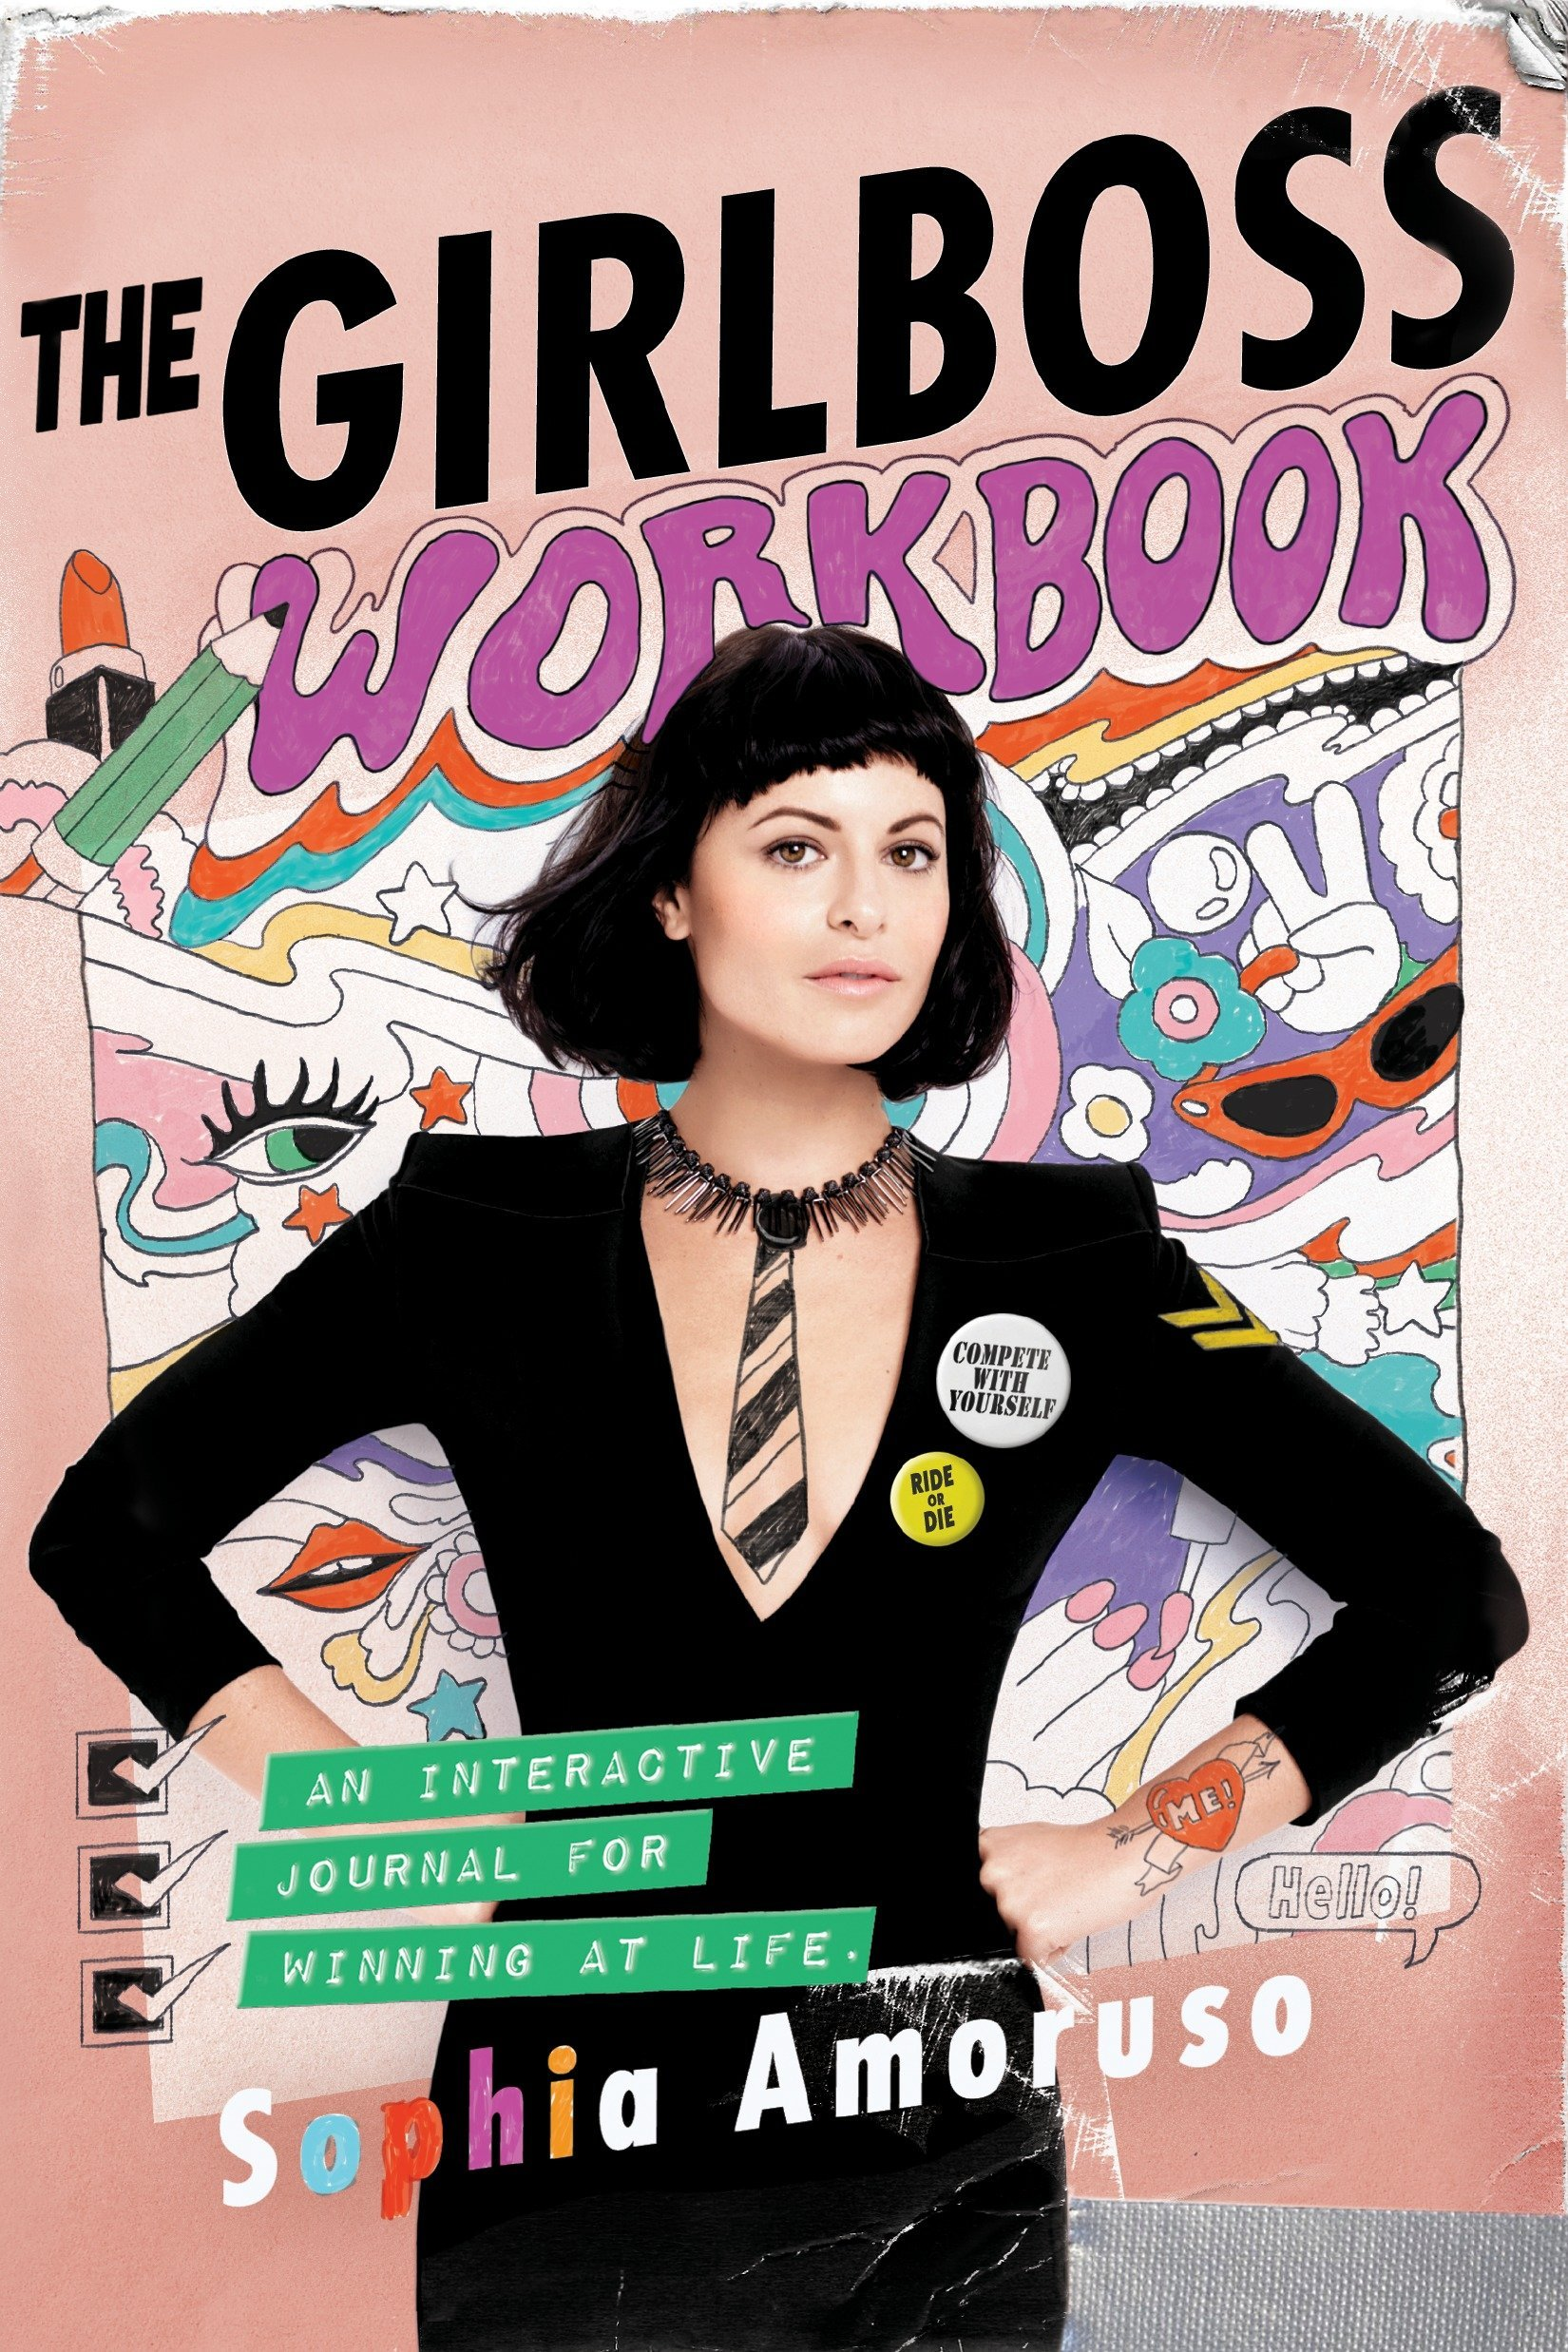 The Girlboss Workbook - $12 on Amazon